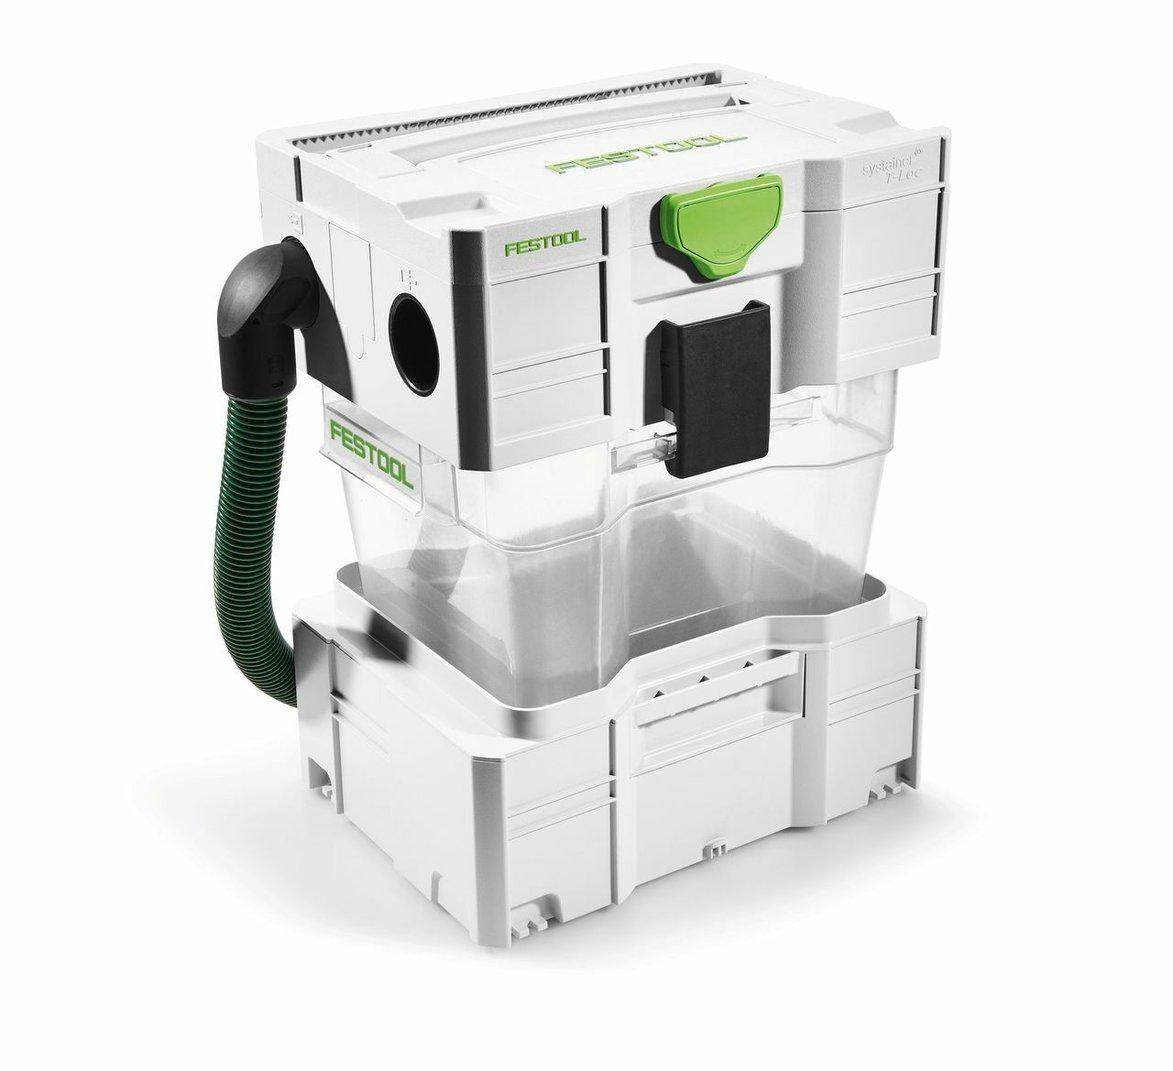 festool dust extractor accessories